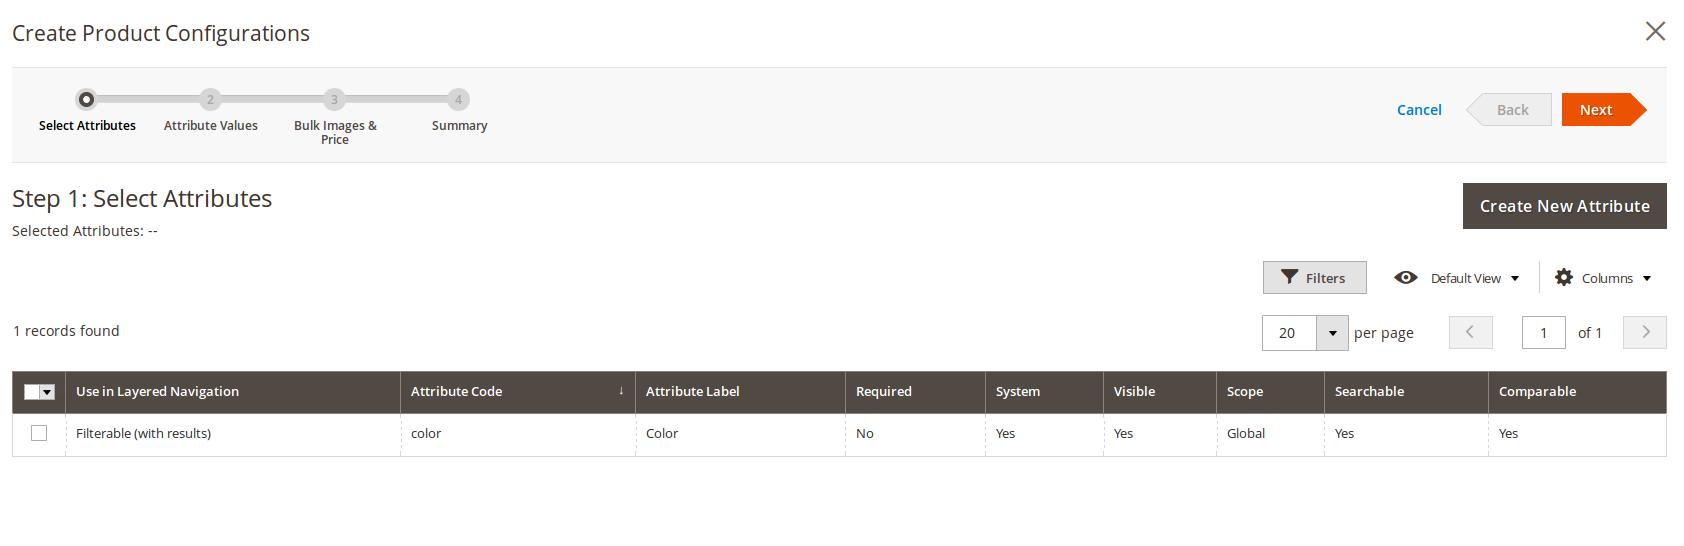 Selección de atributos para productos Configurables en Magento2